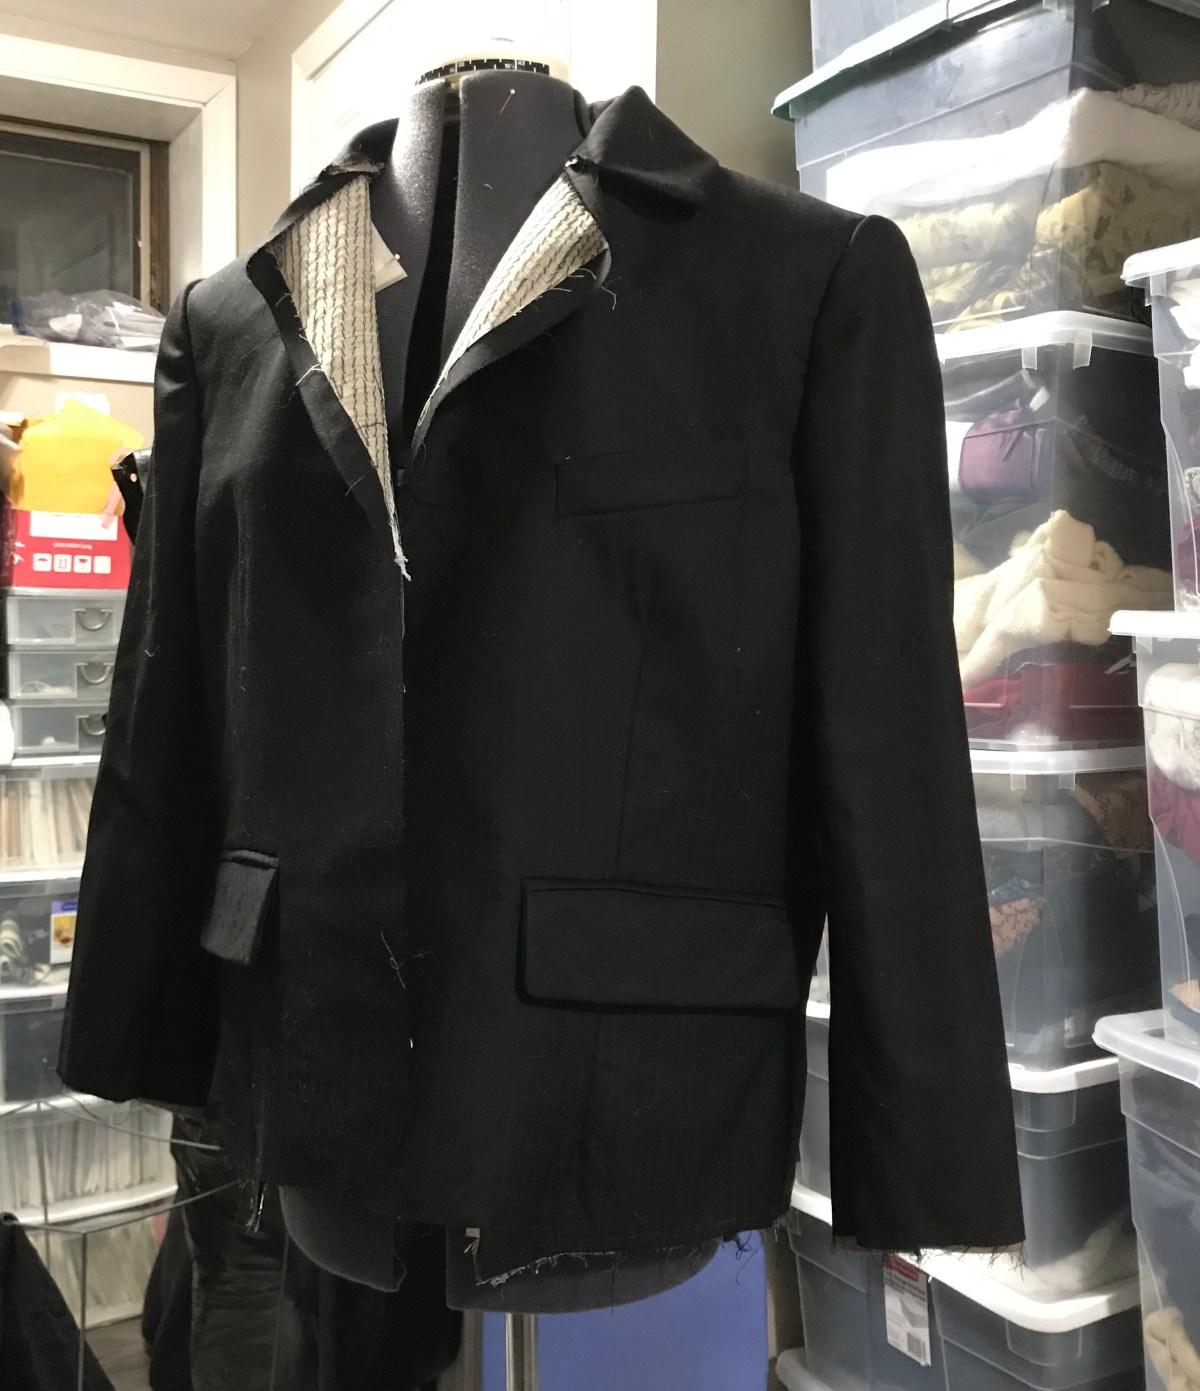 A progress shot of the unfinished jacket on a dressform